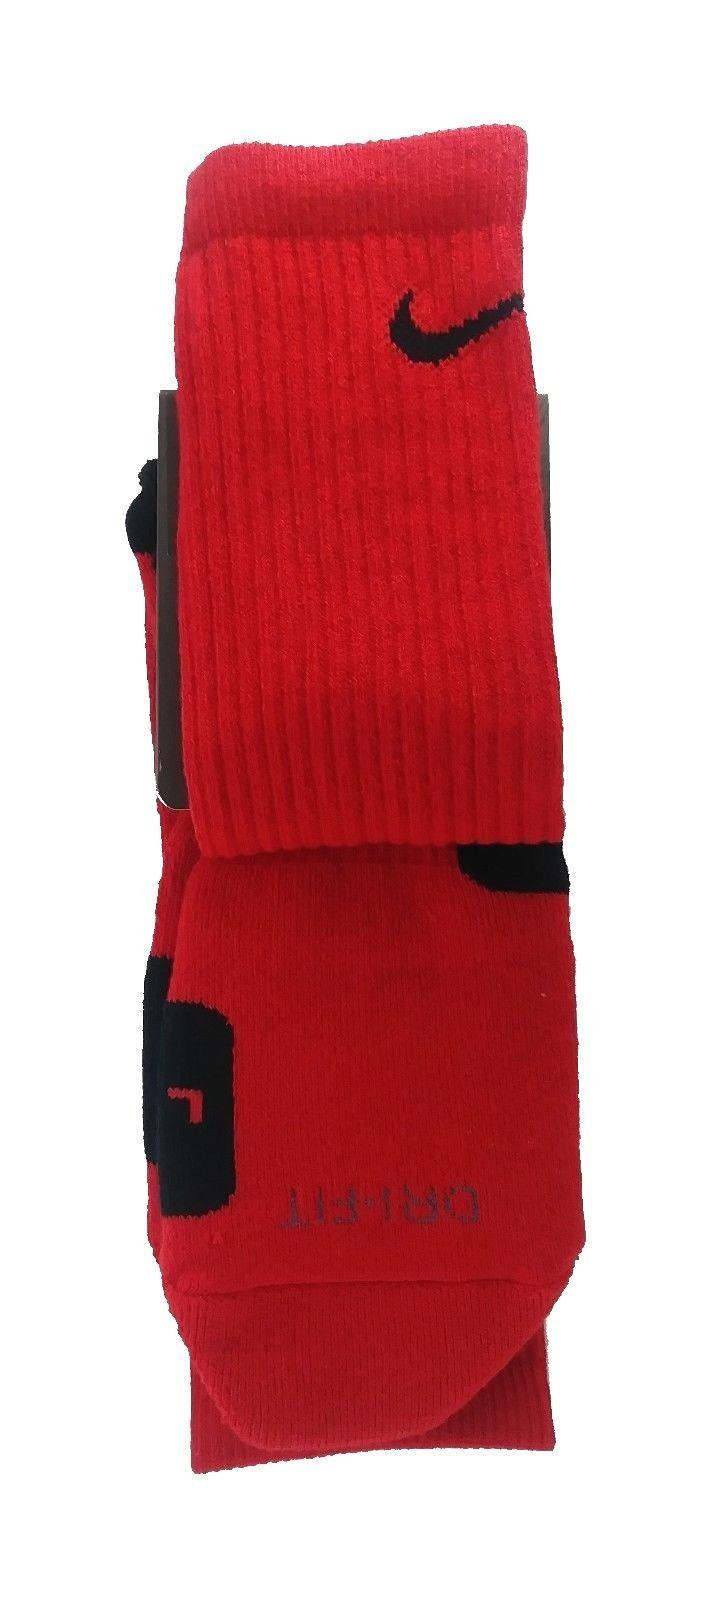 NIKE Elite Cushioned BasketBall Dri-Fit Crew Socks sz L Large (8-12) Red Black